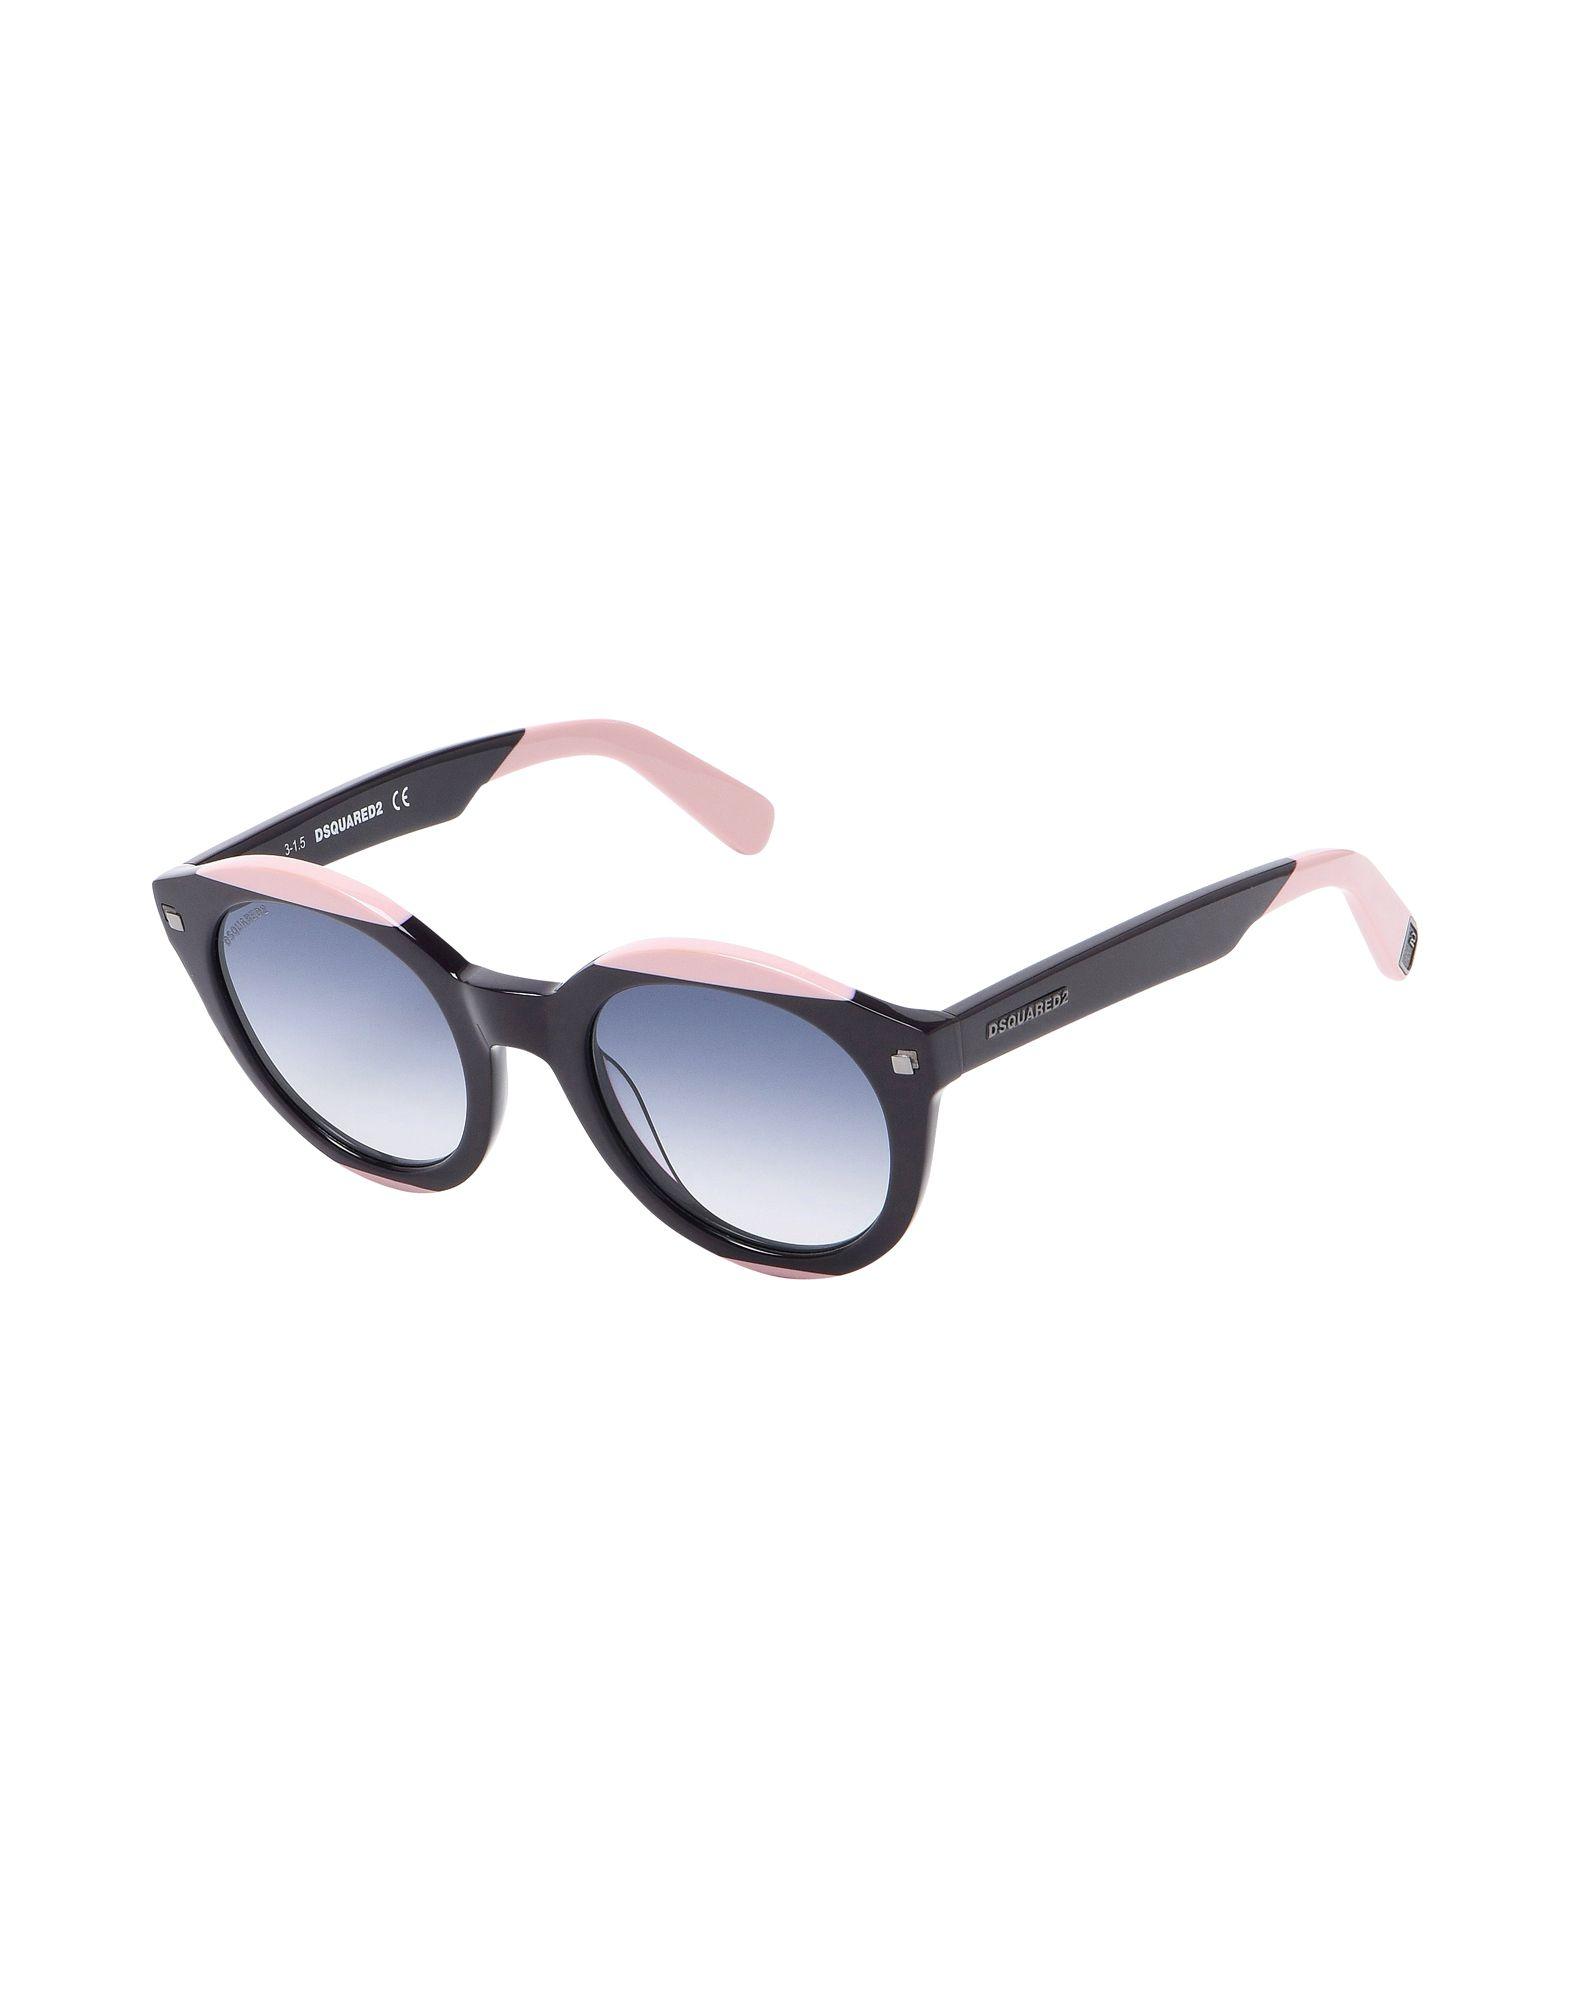 DSQUARED2 Солнечные очки очки корригирующие grand очки 2 5 fm862 c4